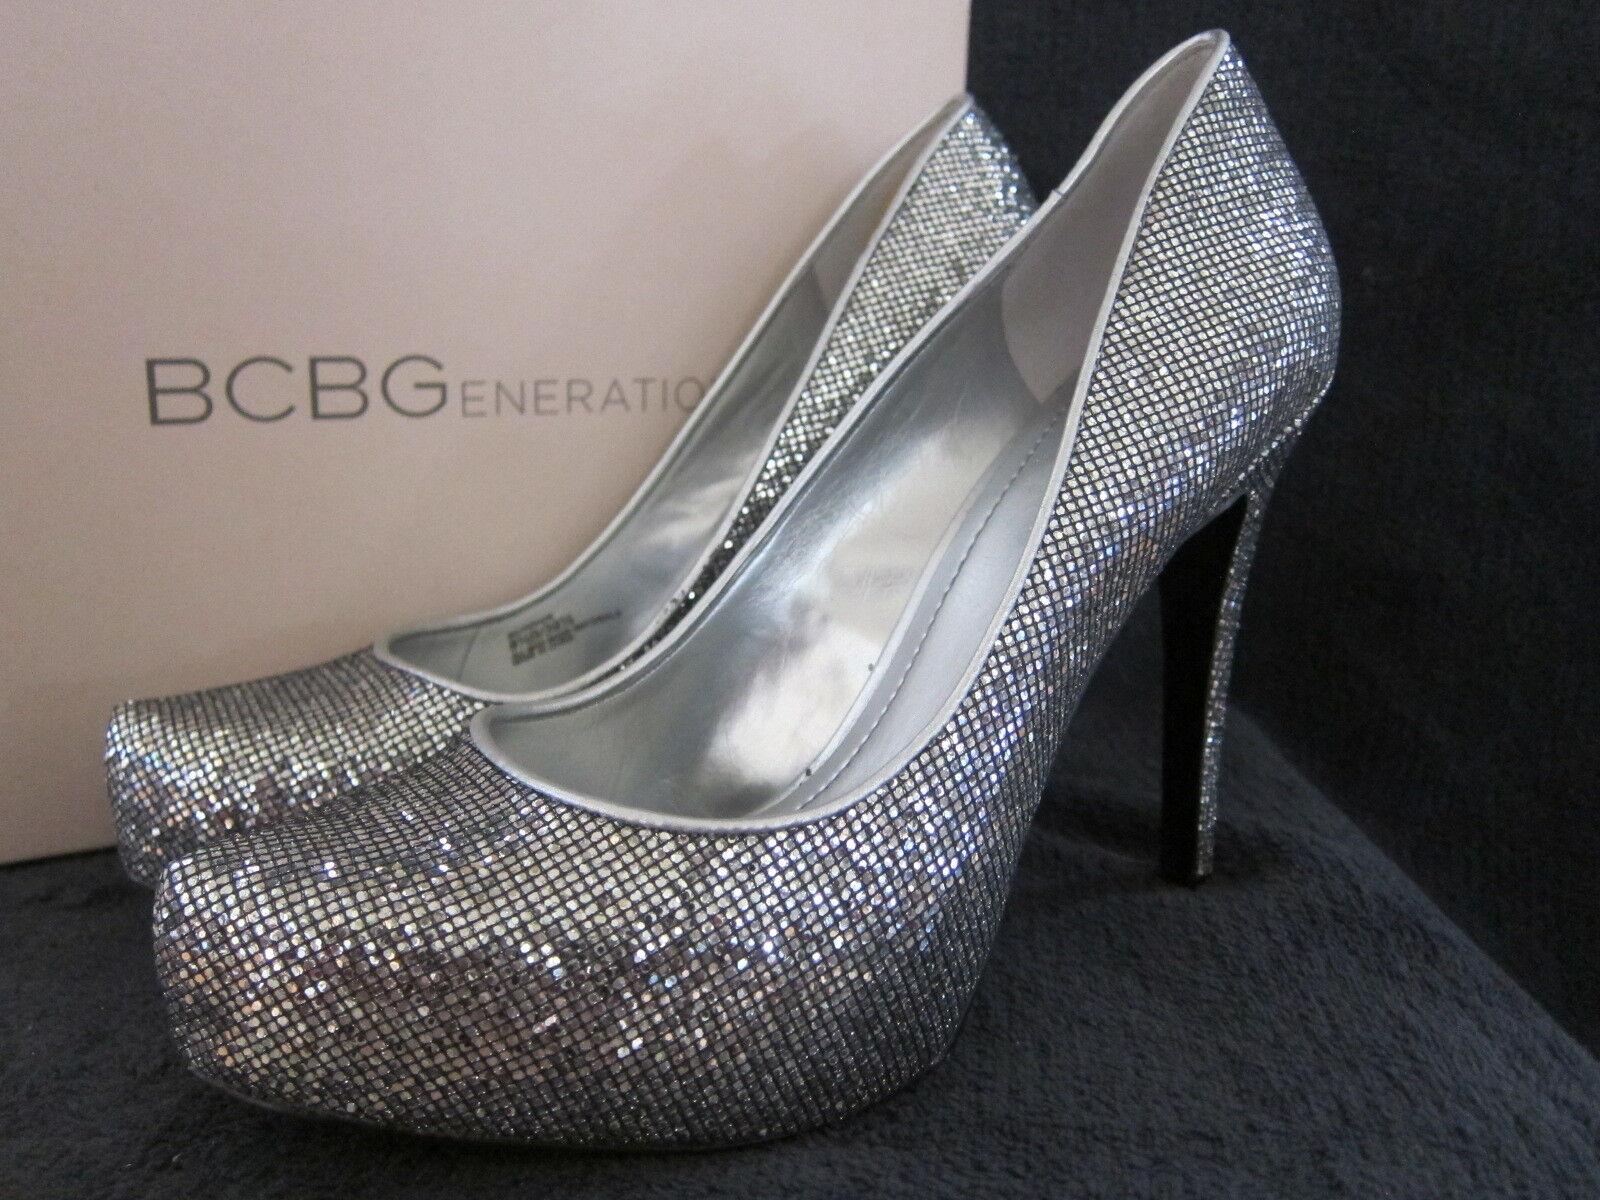 BCBGeneration BCBG BCBG BCBGeneration Parade Silber Glitter Heels Pumps schuhe US 9.5 M EUR 39.5 NWB c609cd